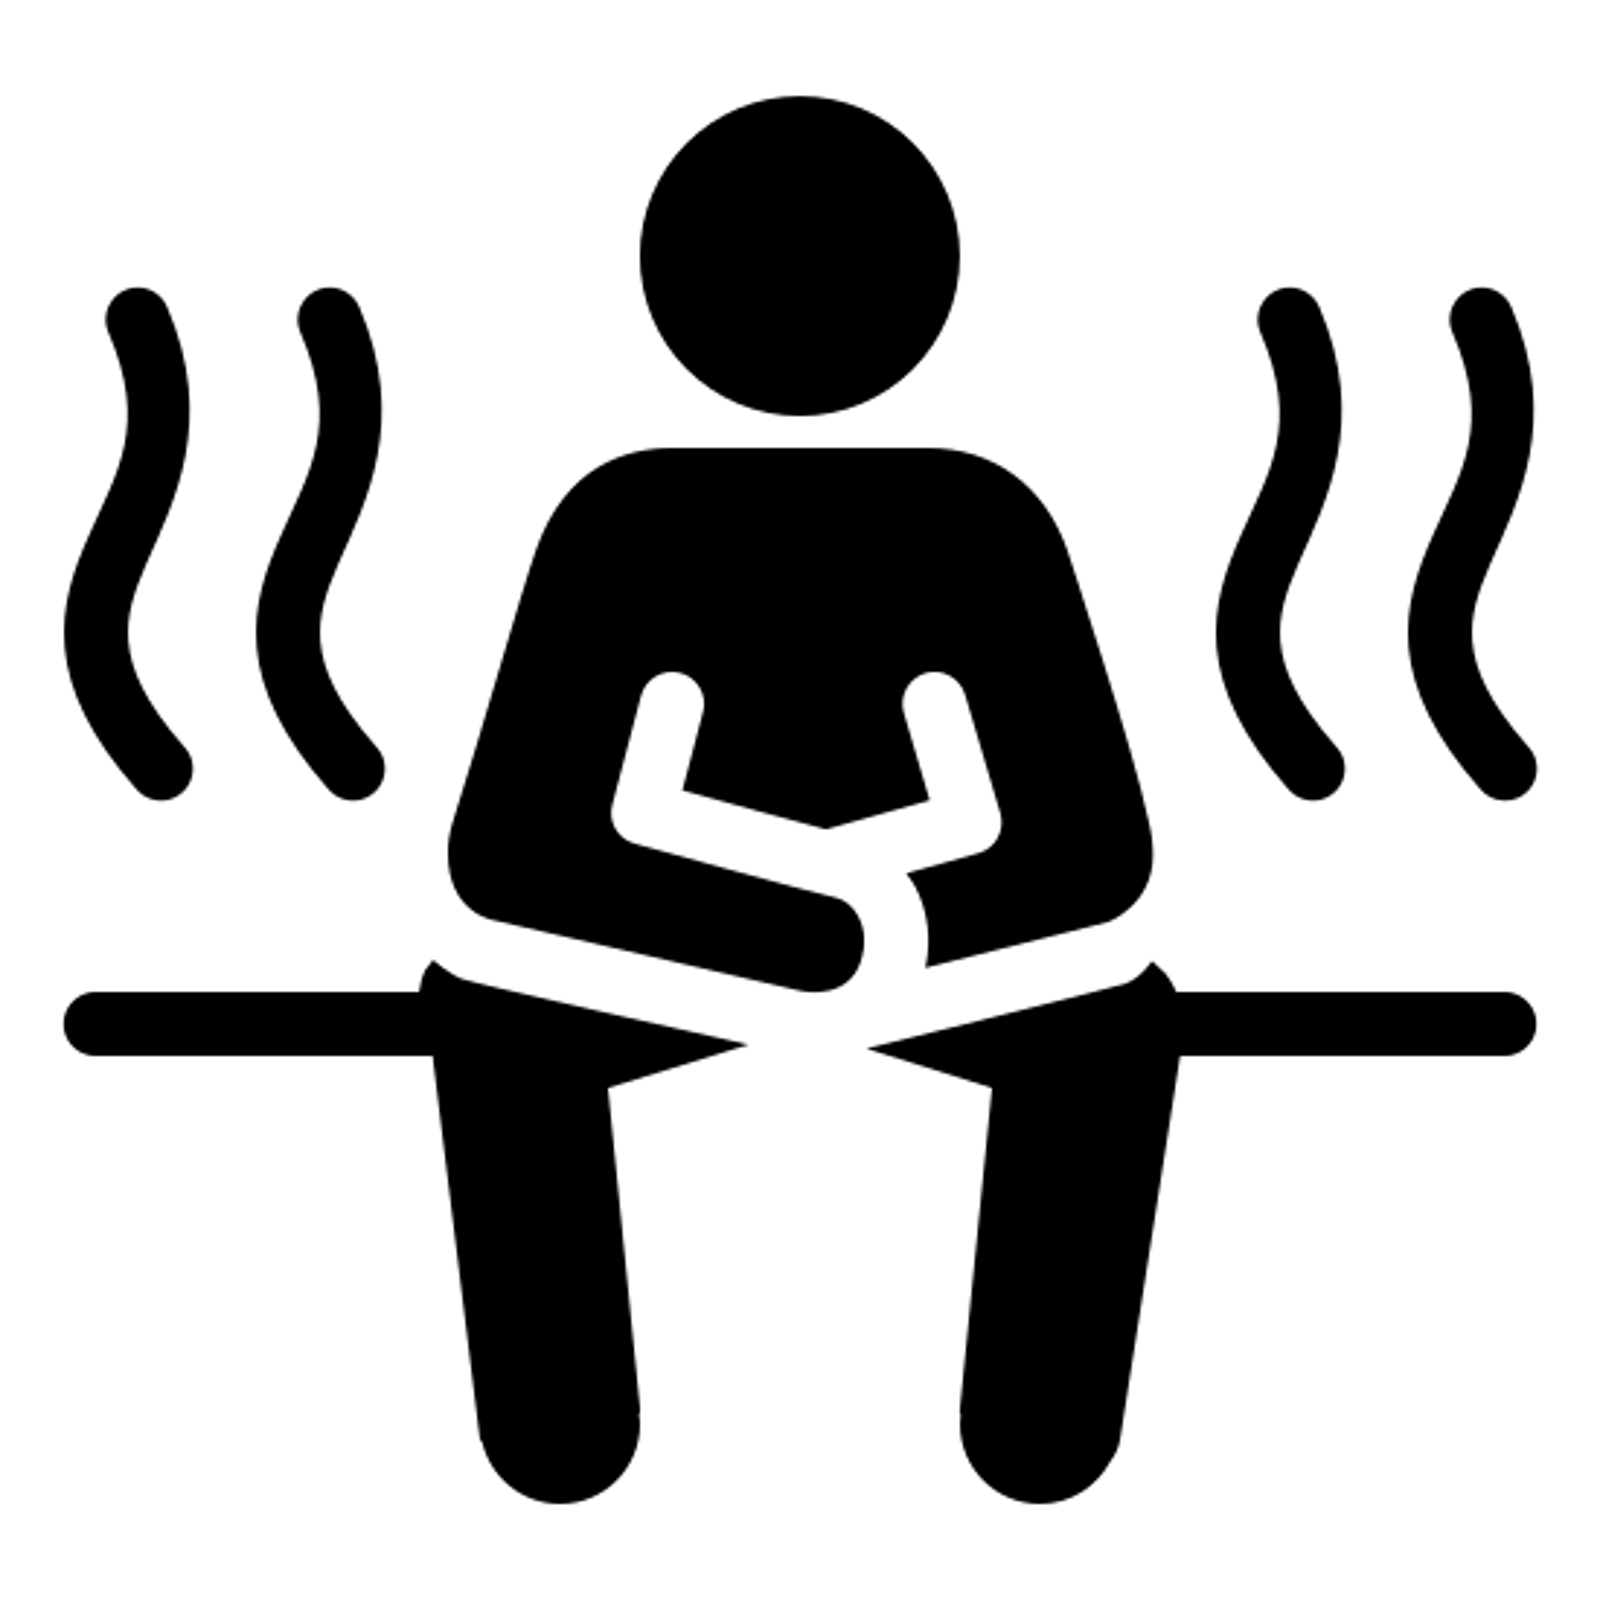 Sauna Filled icon